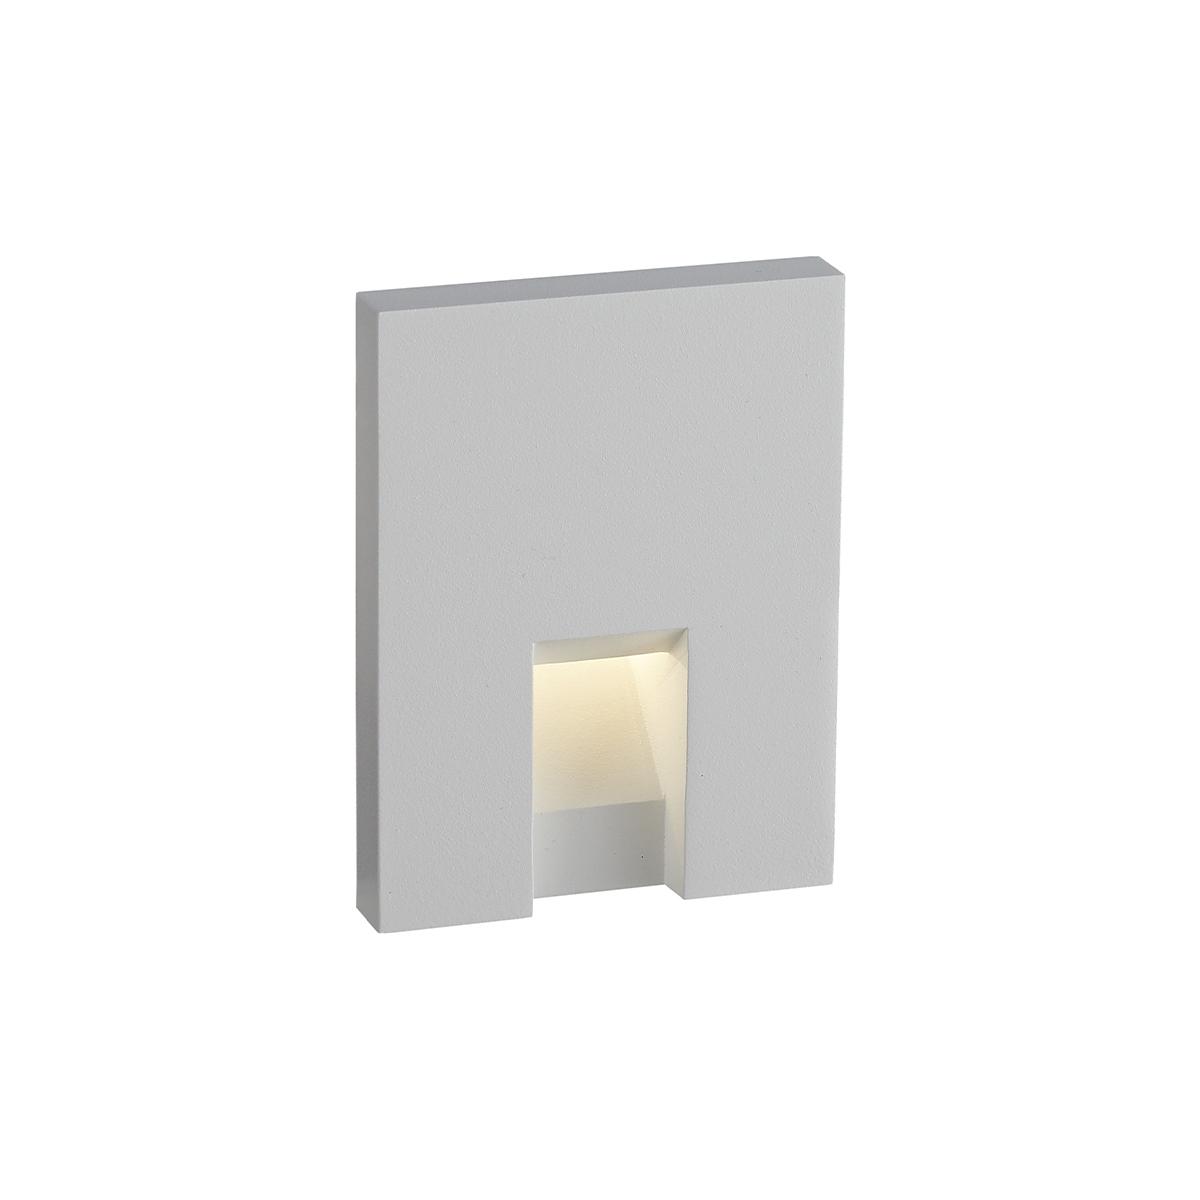 BWS Wandlamp LED Runn S 7.5x7.5x6.5 cm 1.5W 157Lm Aluminium Wit